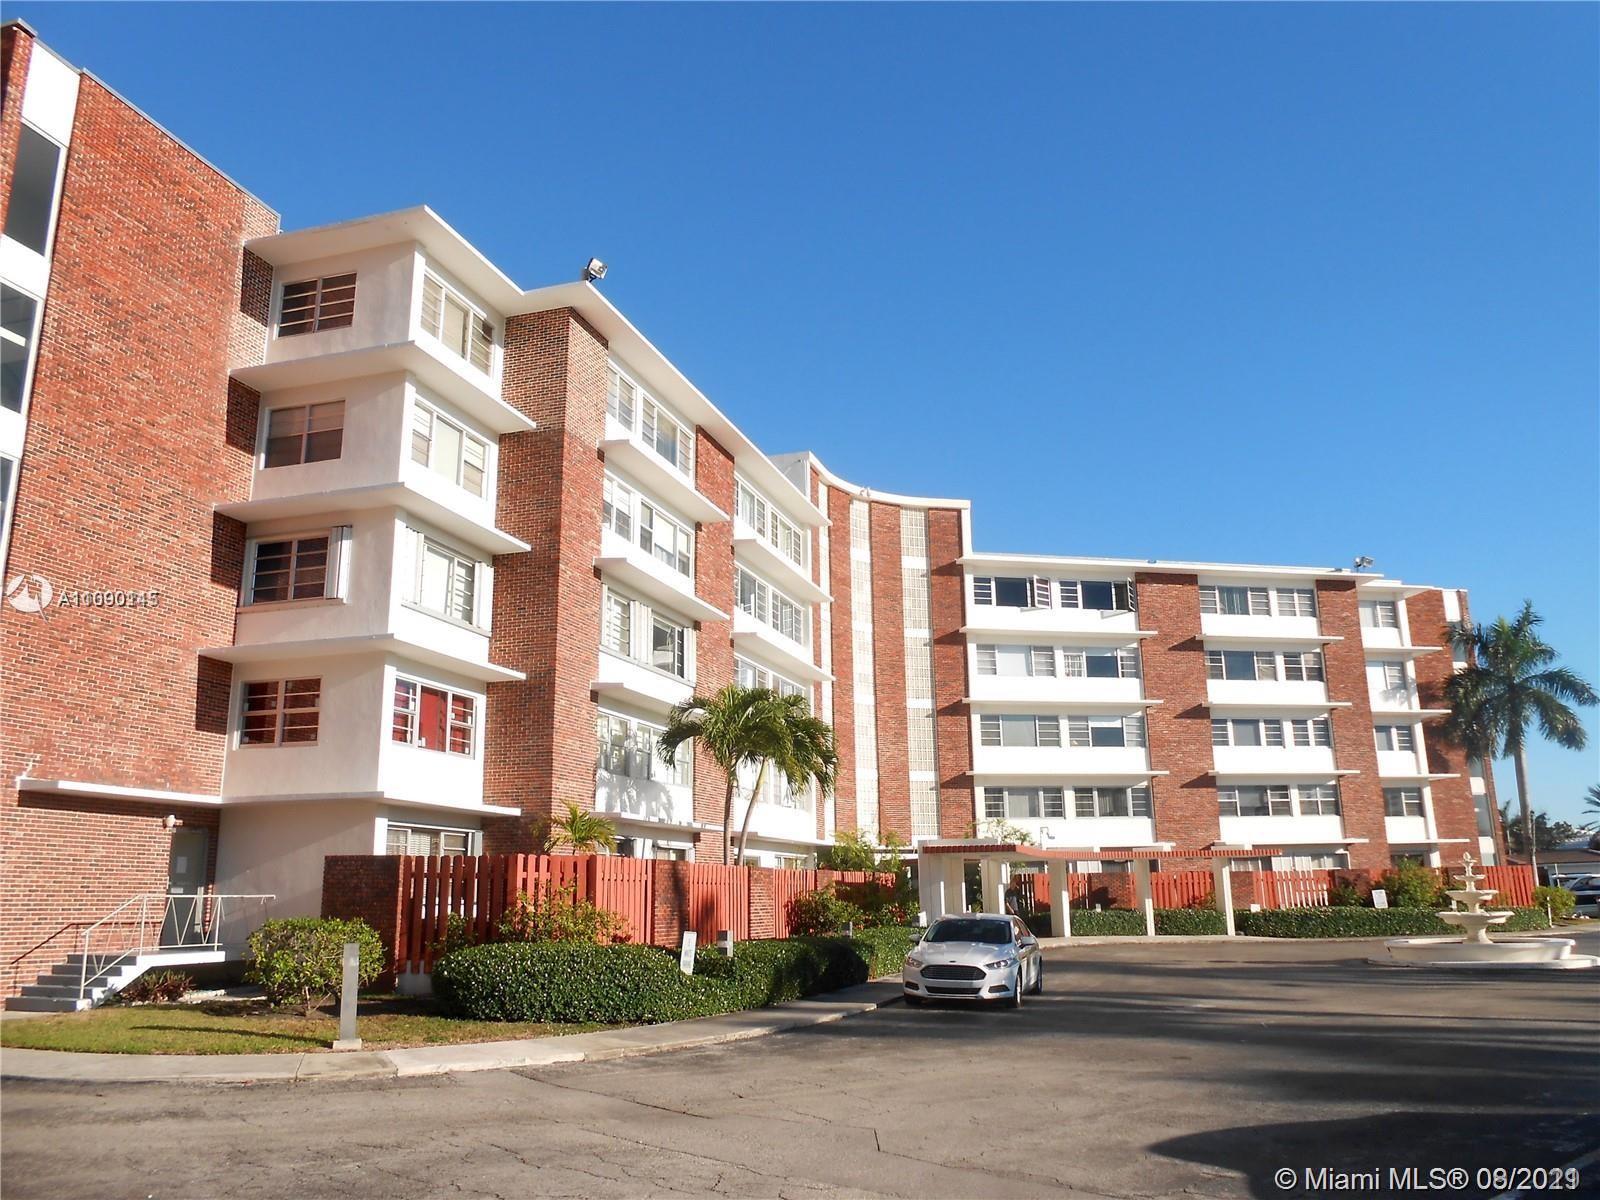 1700 105th St Unit 101, Miami Shores, Florida 33138